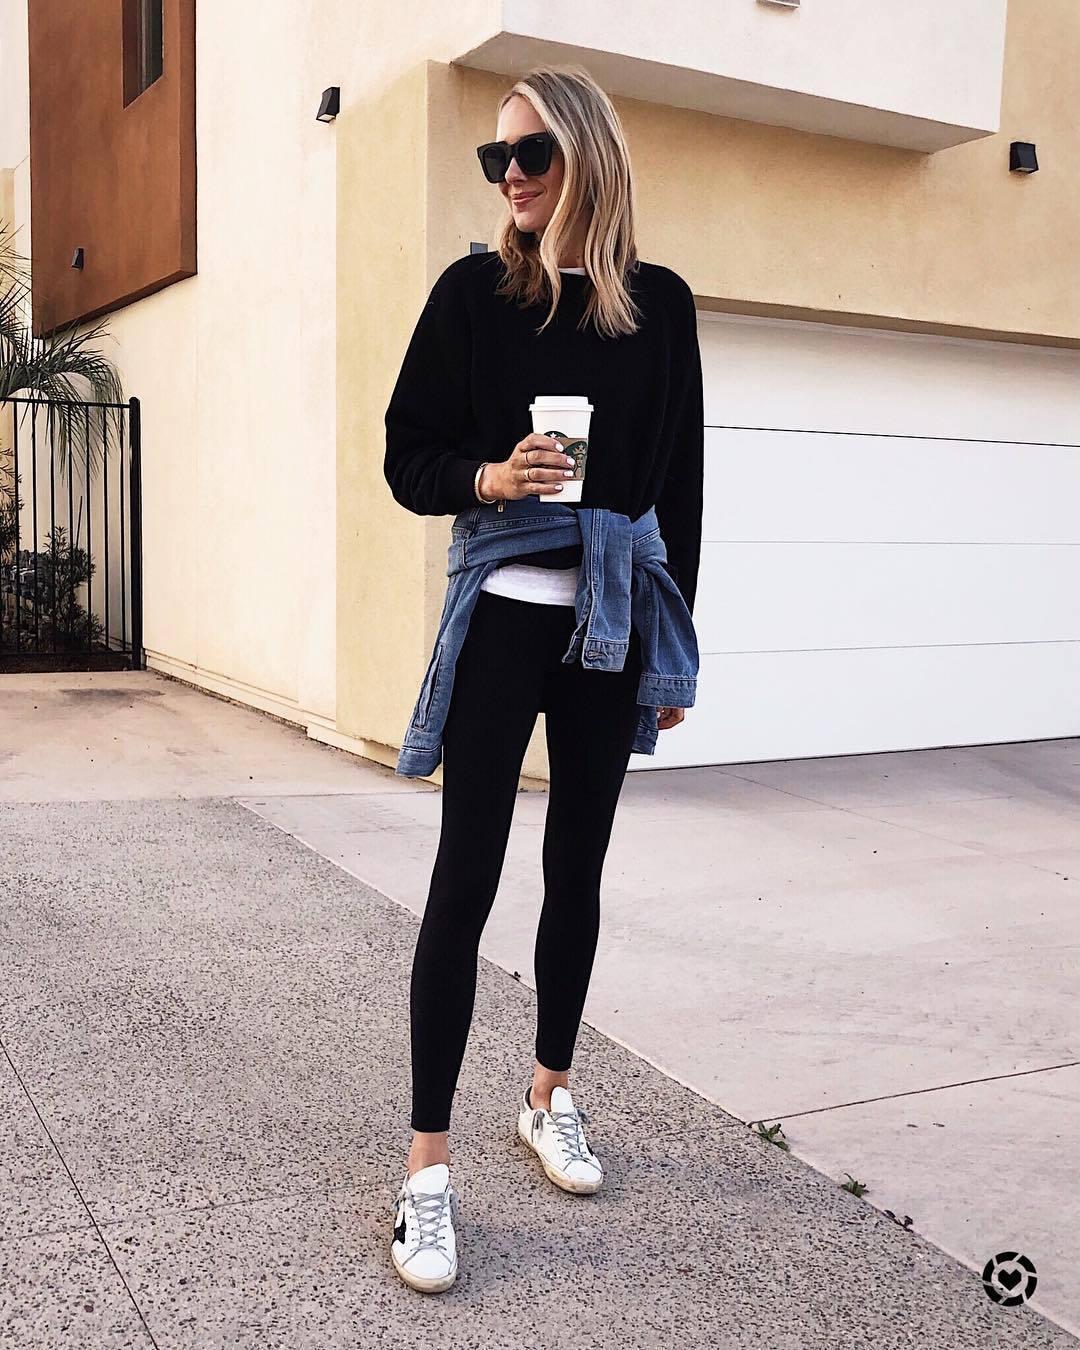 top sweatshirt white sneakers black leggings denim jacket sportswear sunglasses white t-shirt